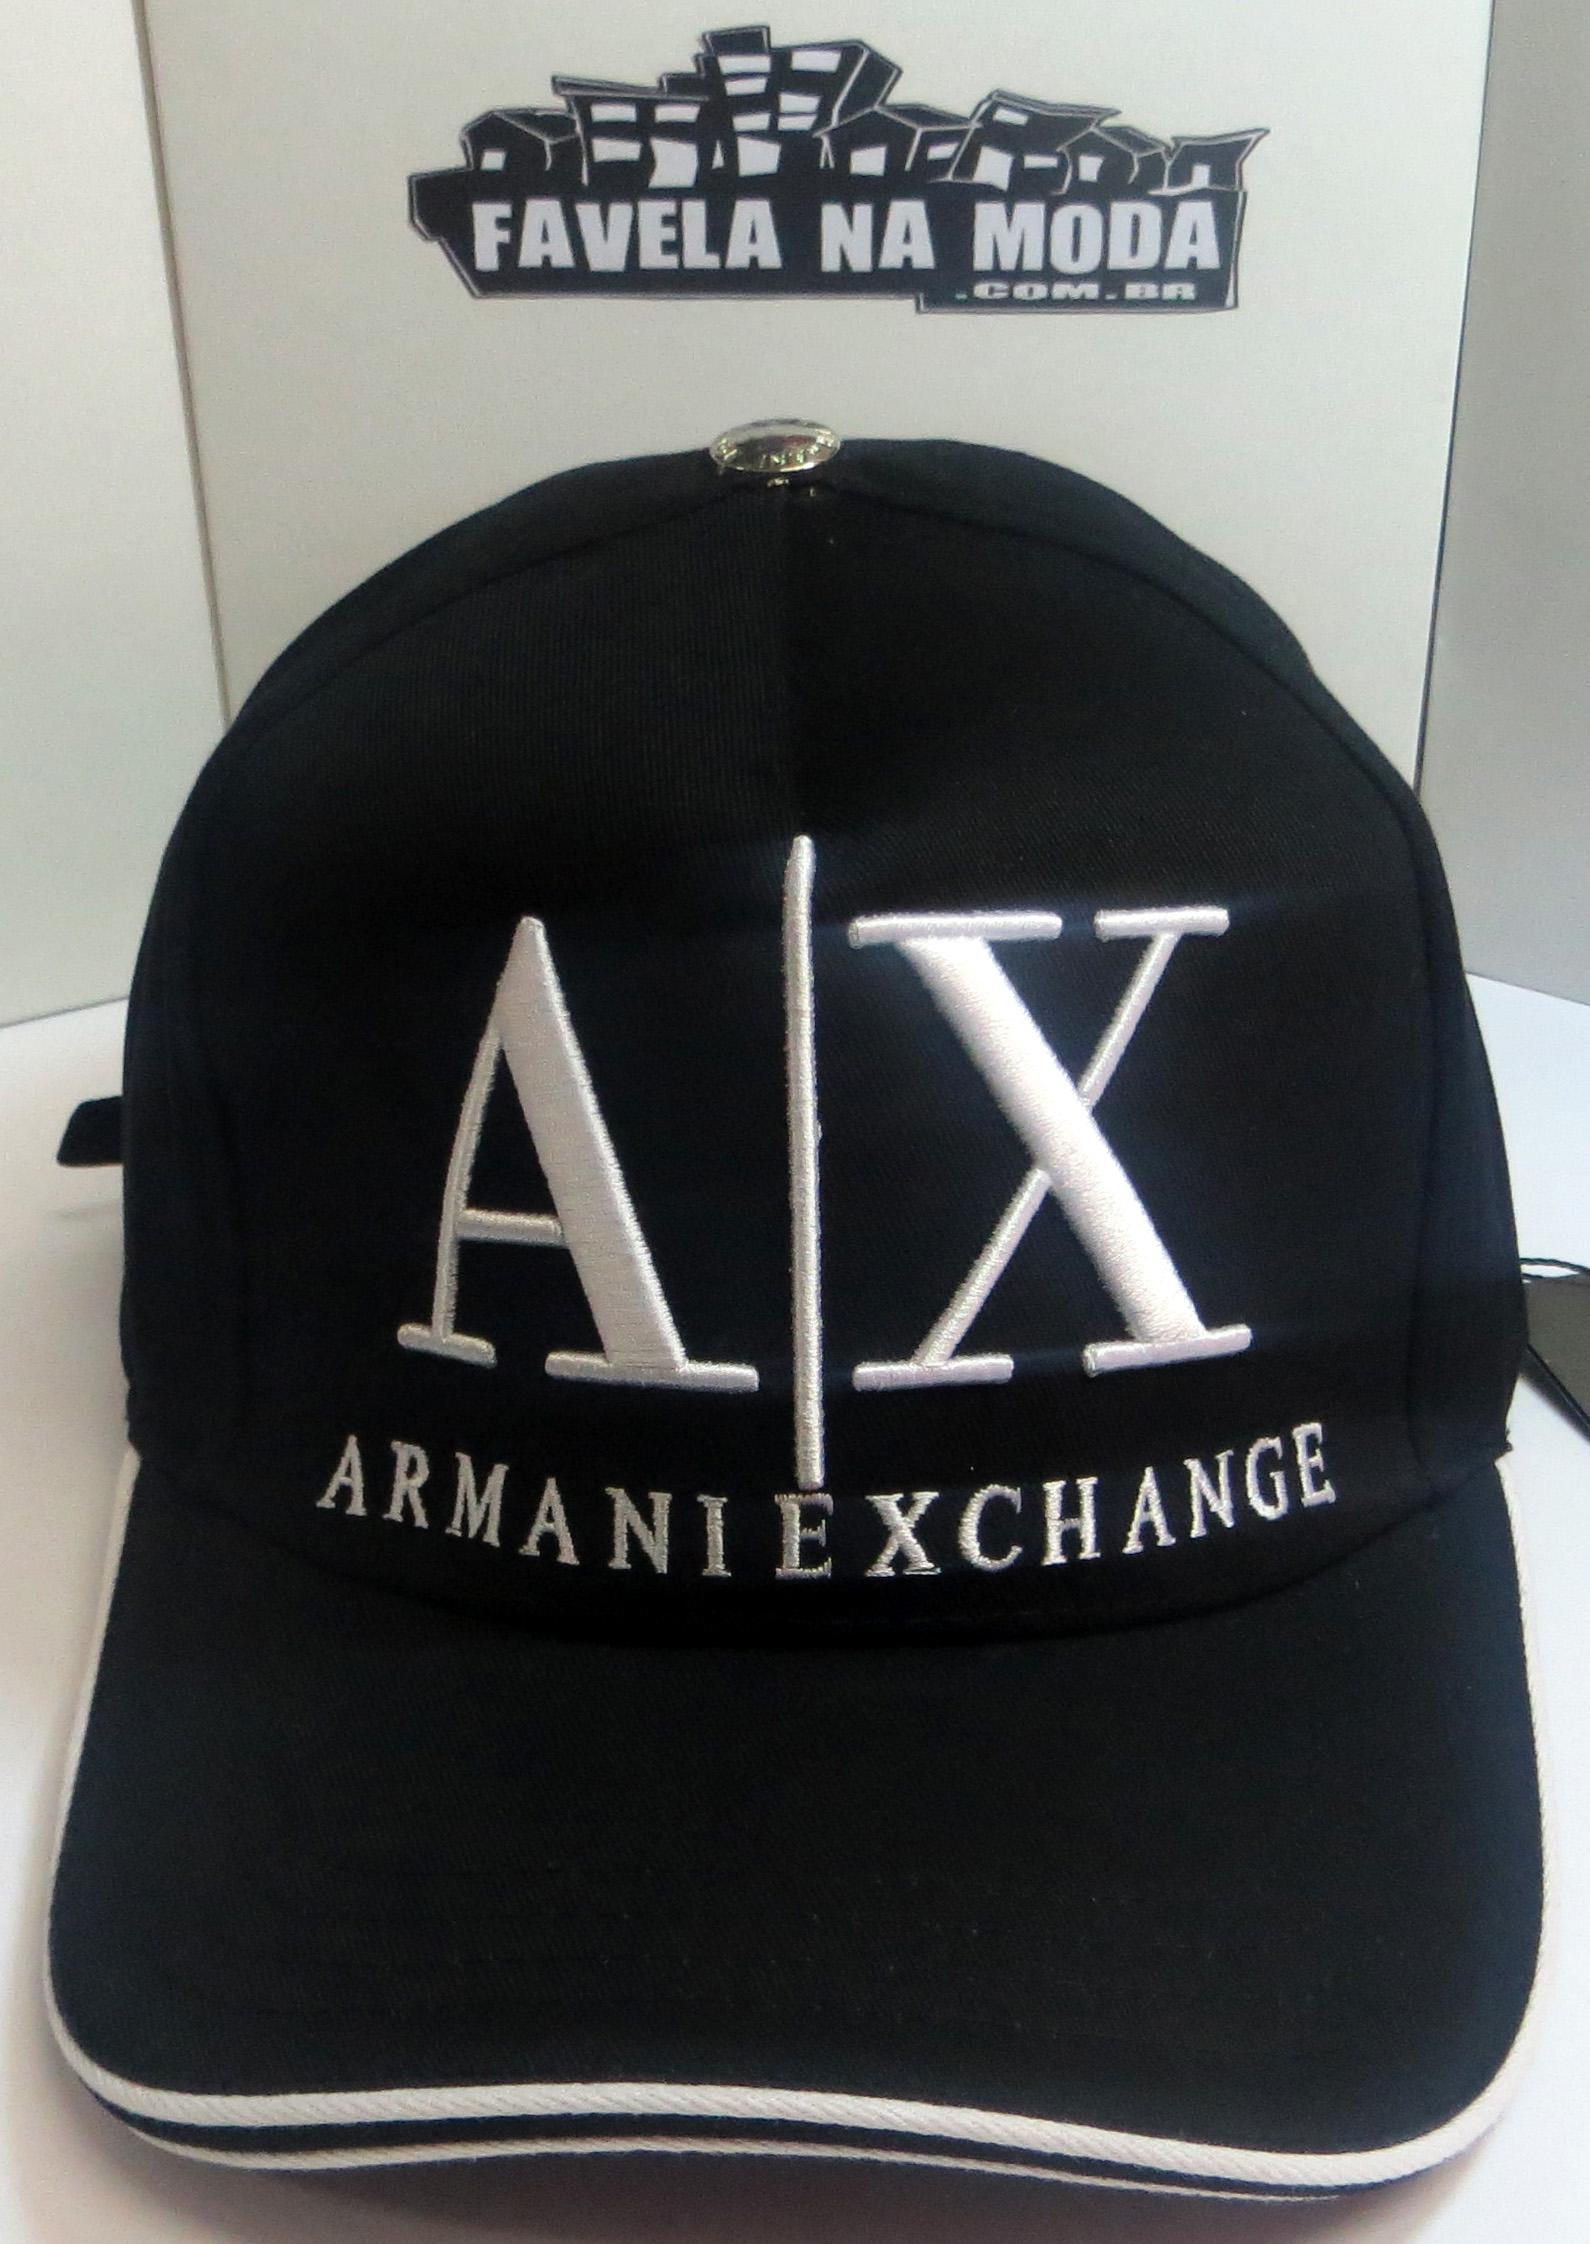 ab9735b54eeb8 Boné da armani exchange – Roupa de banho